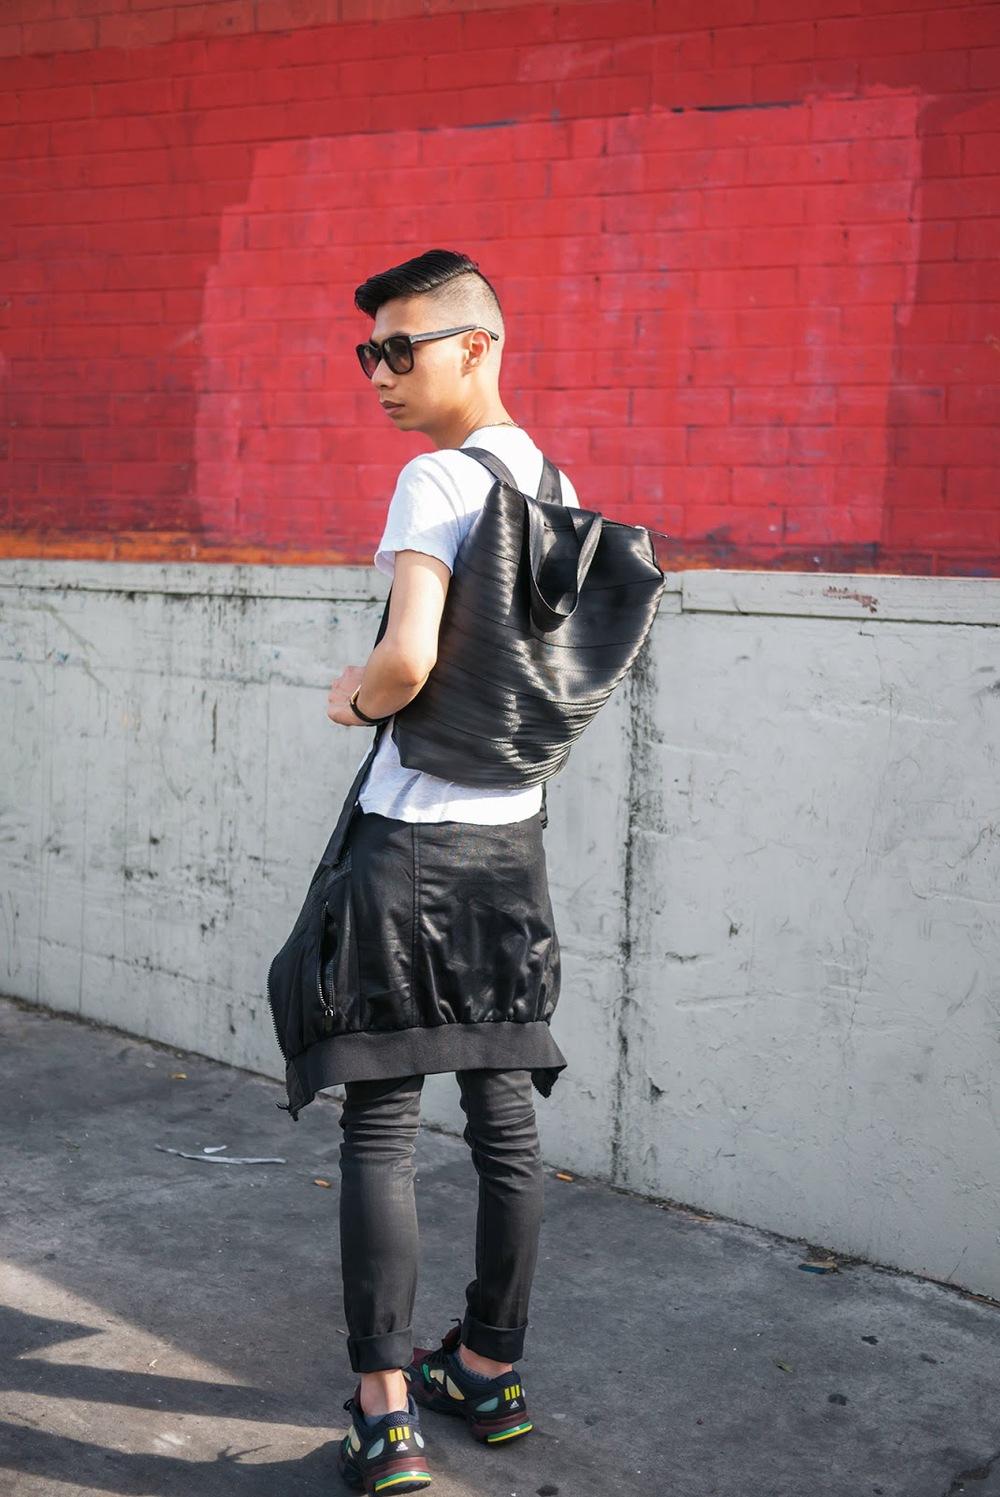 mybelonging-tommylei-menswearblogger-streetstyle-kaopaoshu-adidas-rafsimons-warbyparker-8-copy.jpg